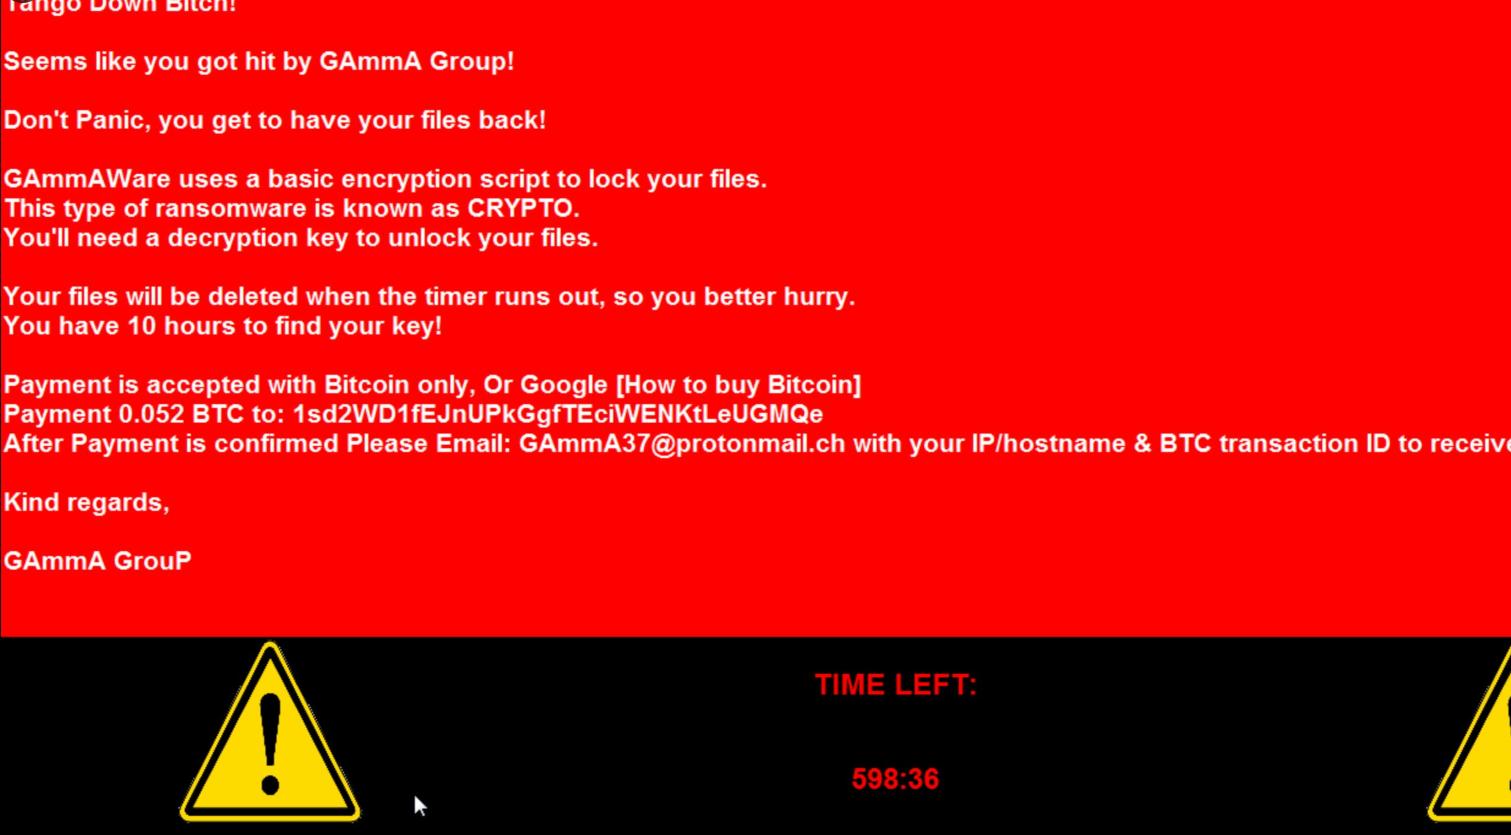 GAmmAWare ransomware